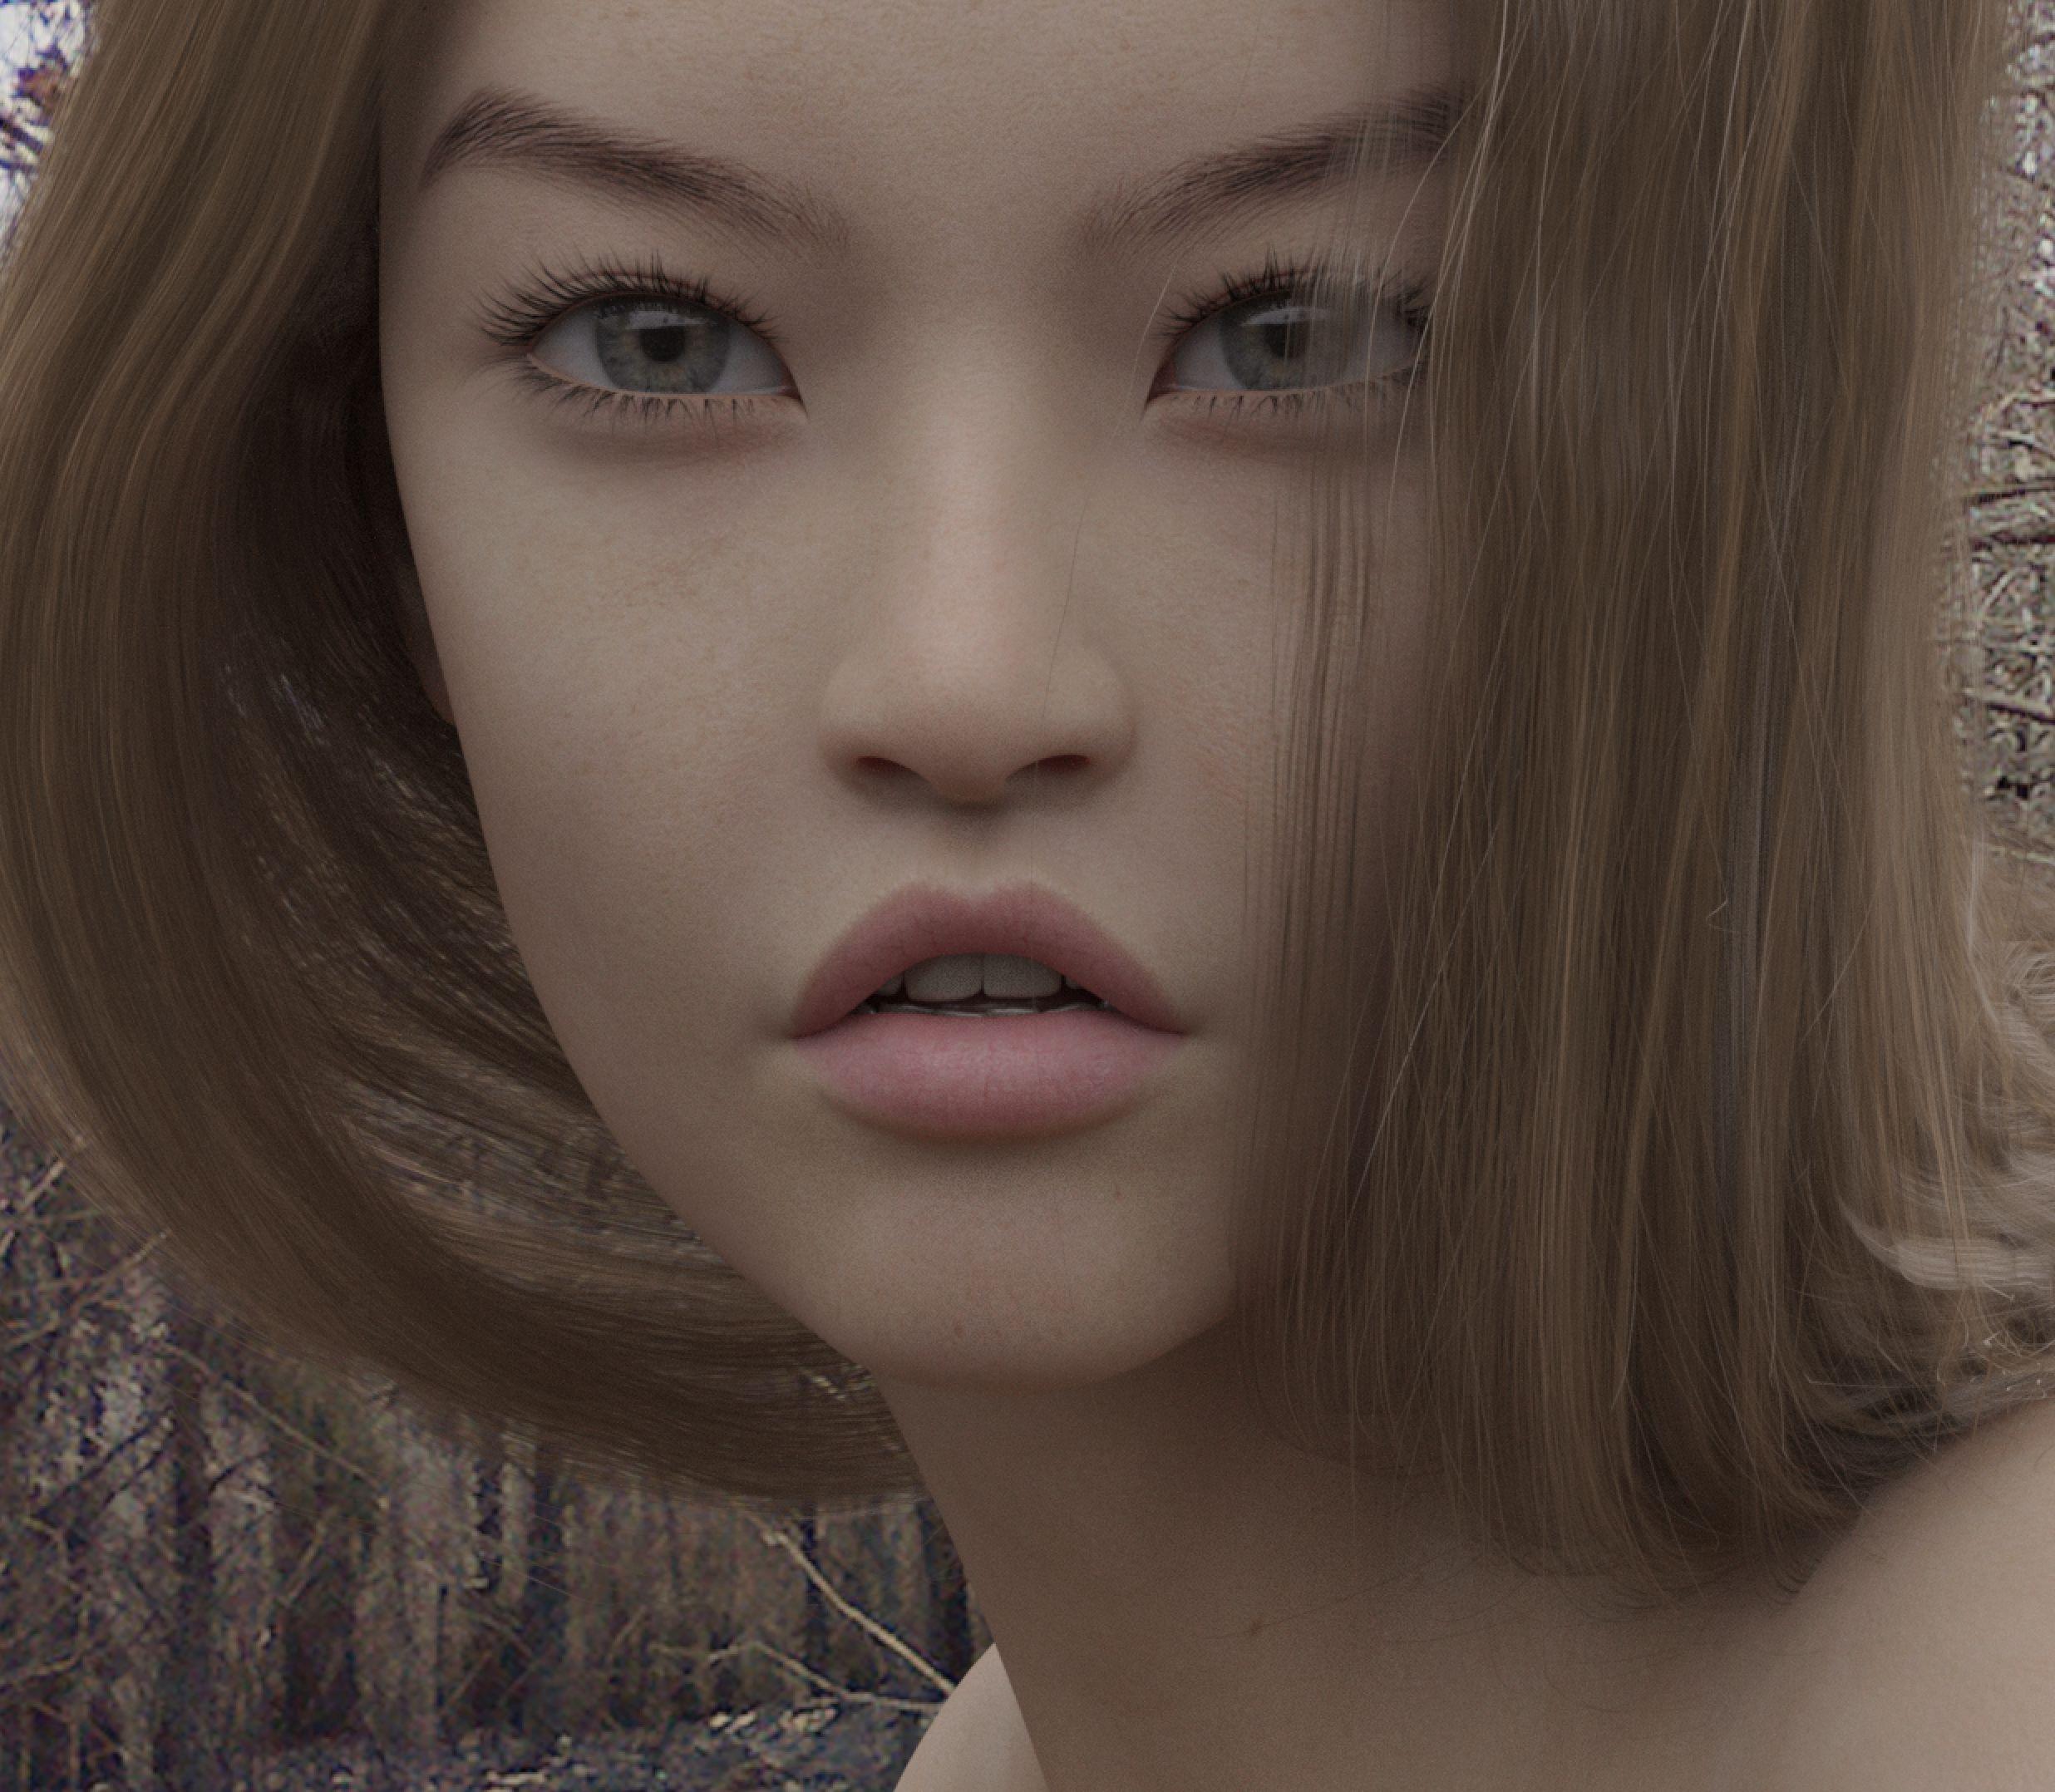 #3DCG #fashion #ComputerGraphics #Photorealism #digitalsupermodel #fashion #voguemagazine #vogueitalia #Hypebeast #3dworldmagazine #virtualinfluencer #virtualhuman #digitalmodel #behance #businessoffashion #wmagazine #highsnobietyjp #insta_daz3d #virtualinfluencer